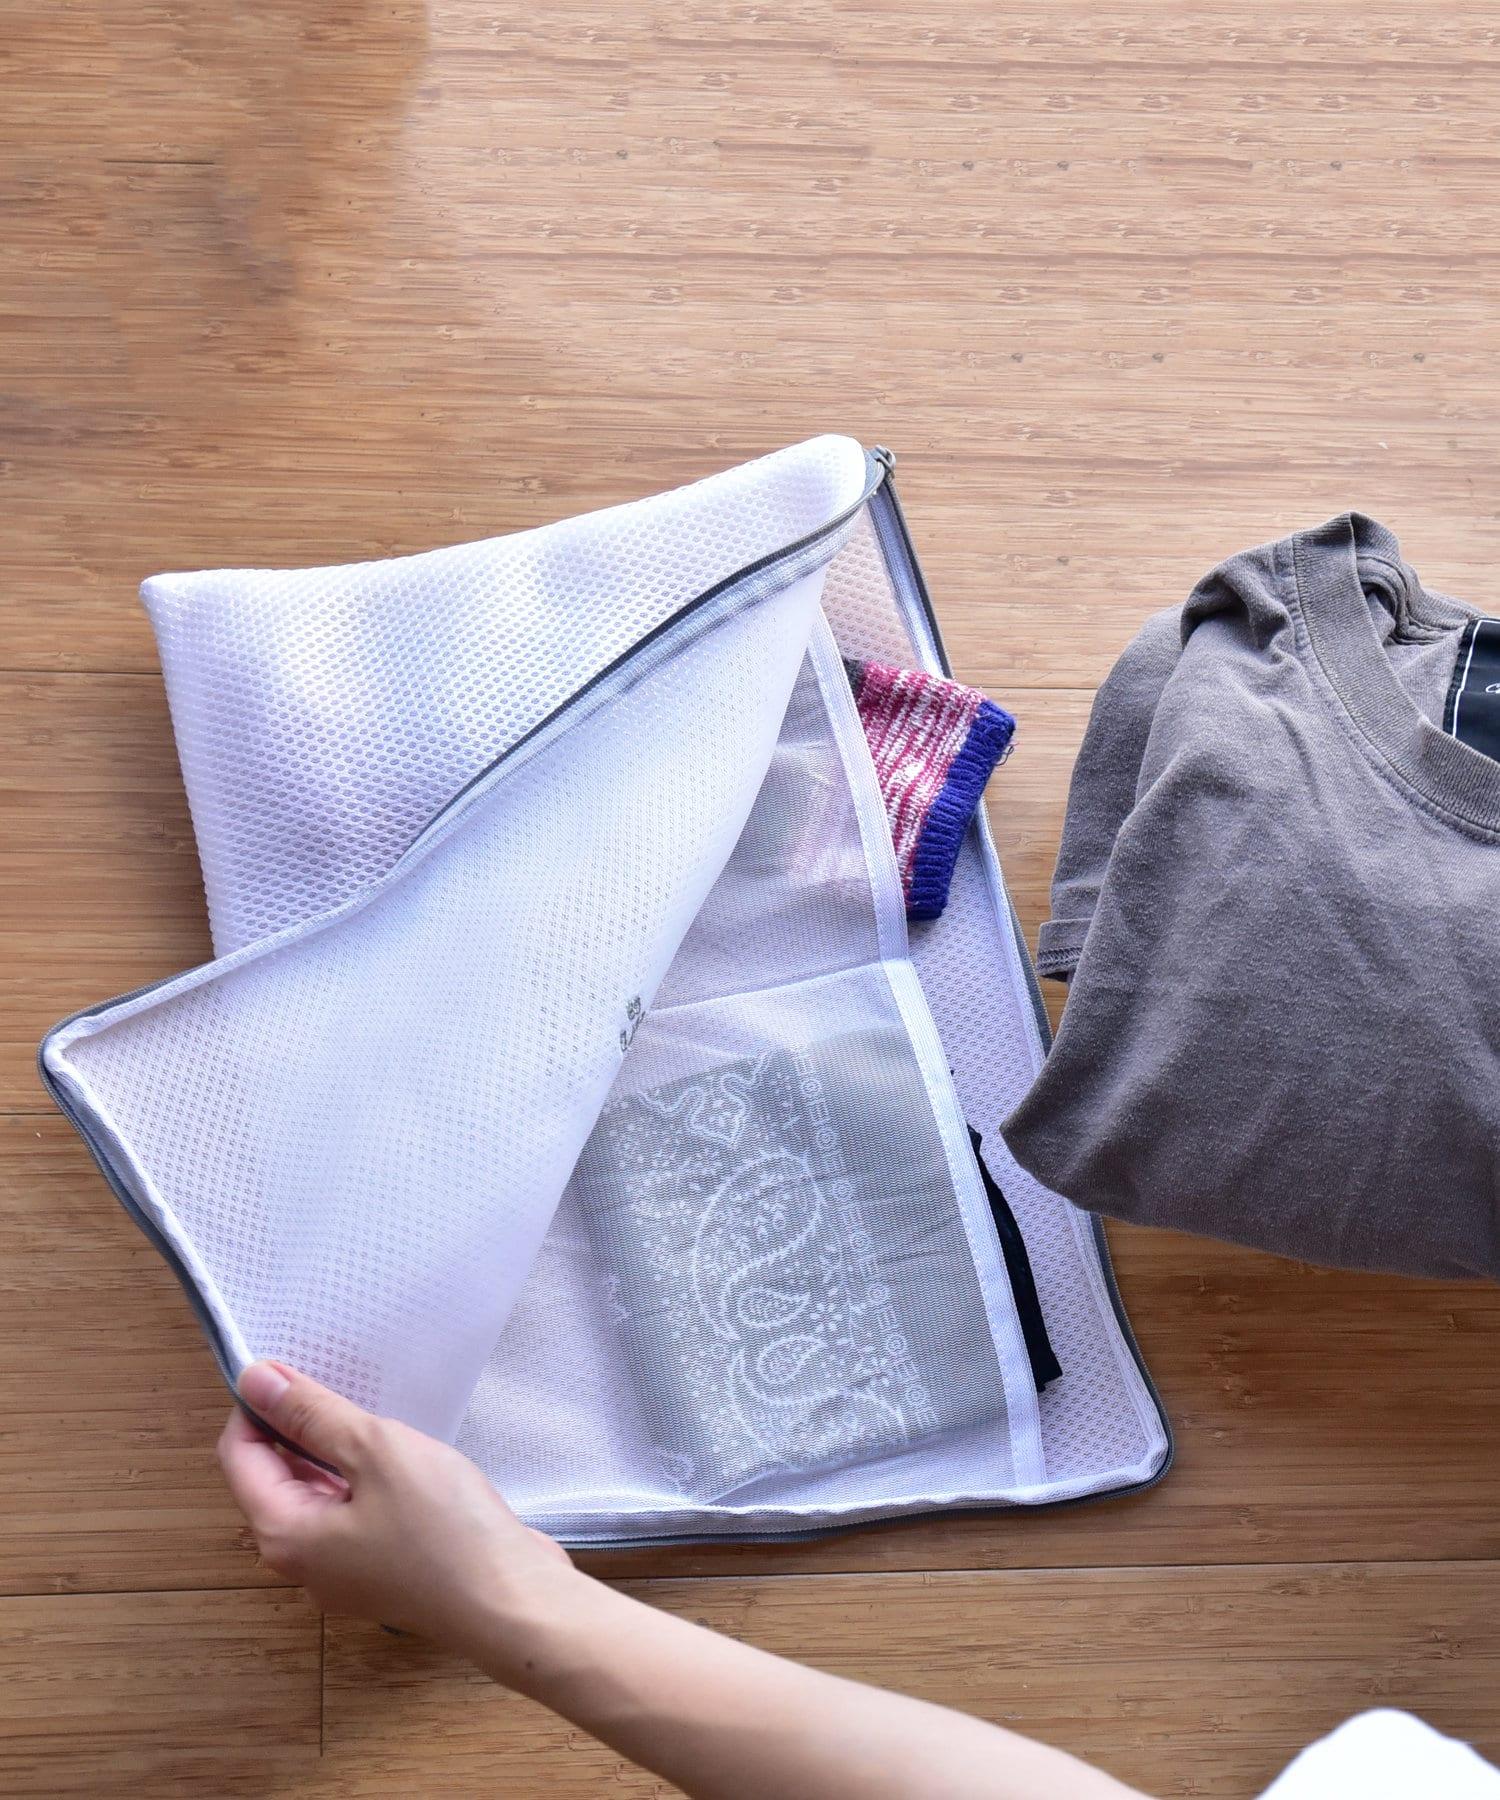 3COINS(スリーコインズ) ライフスタイル 【お洗濯をより快適に】ポケット付きランドリーネット グレー